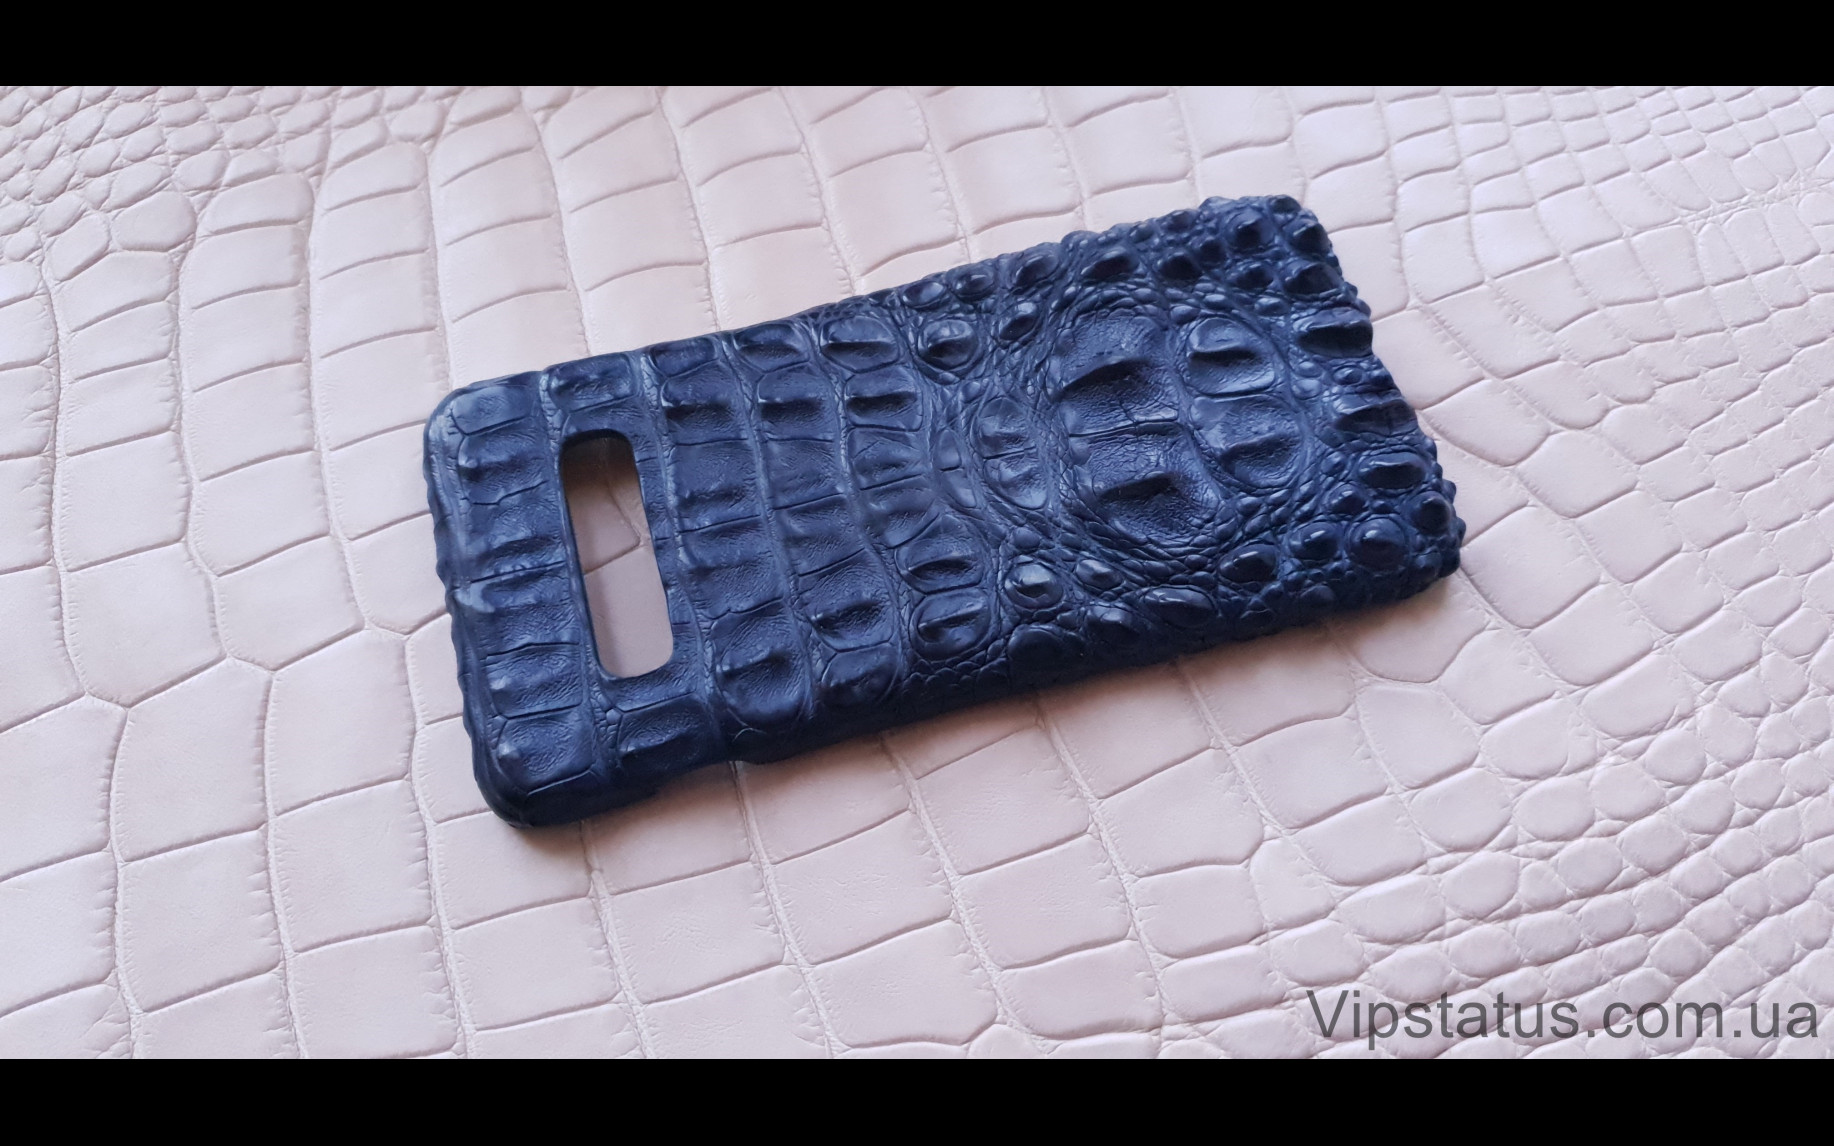 Elite Blue Crocodile Брутальный чехол Samsung S10 S20 S21 Plus Blue Crocodile Brutal case Samsung S10 S20 S21 Plus Crocodile leather image 2